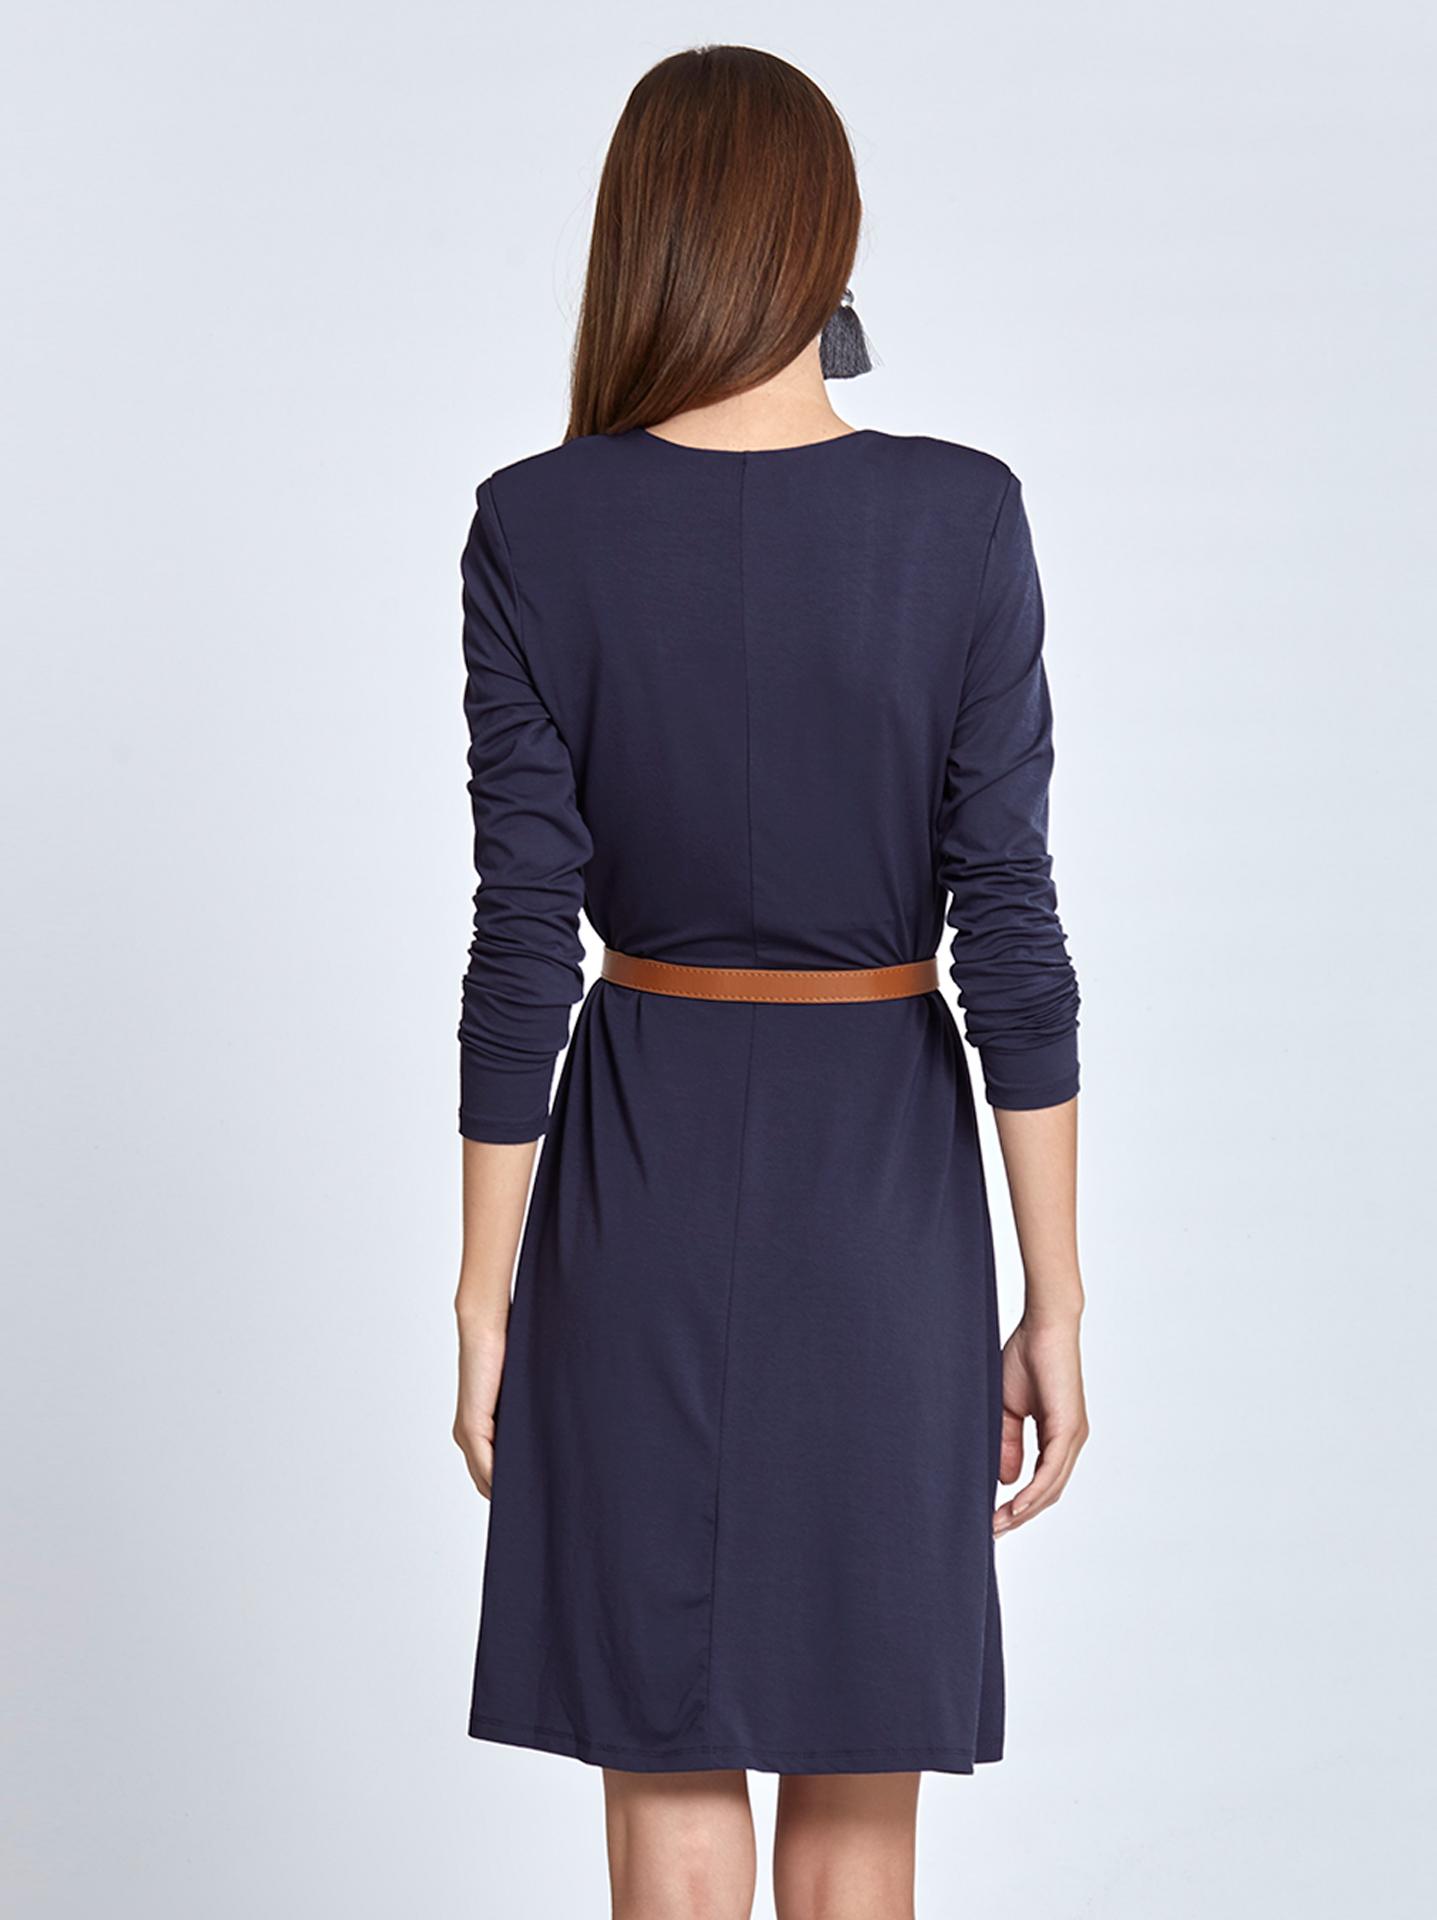 6c57303cd9dd Midi φόρεμα με βάτες σε μπλε ραφ